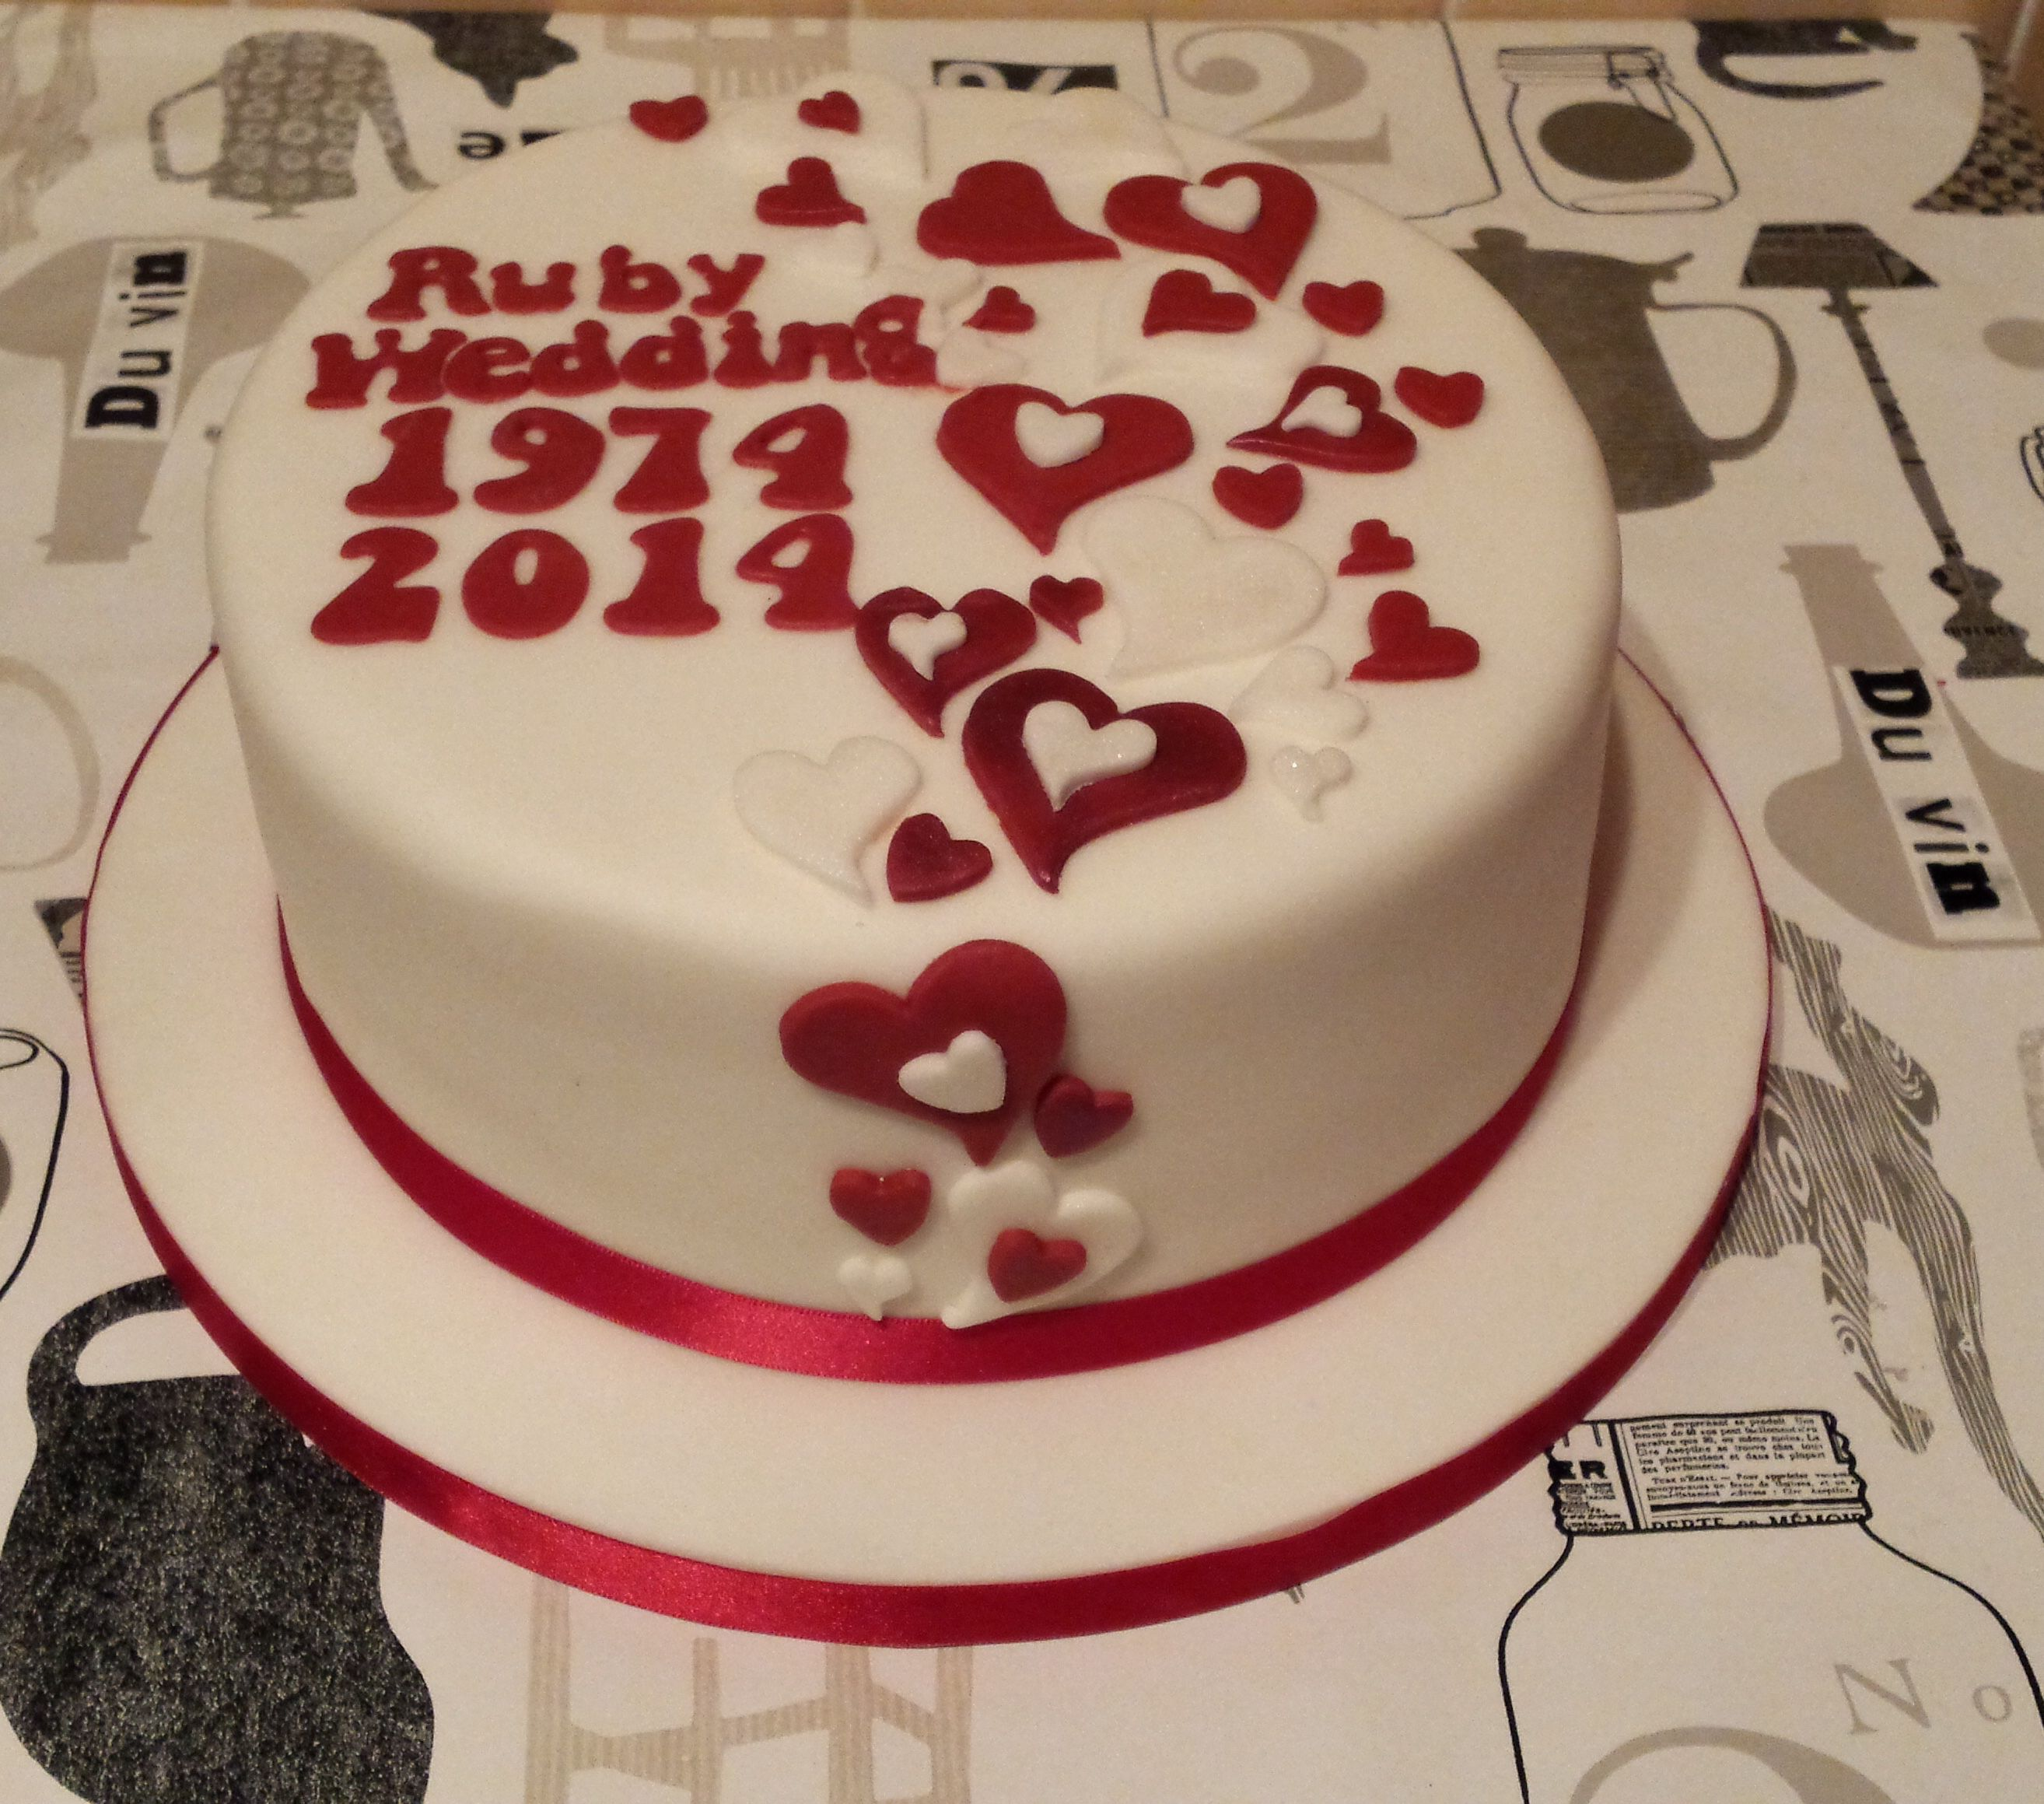 Ruby Wedding Anniversary Cake Cakes